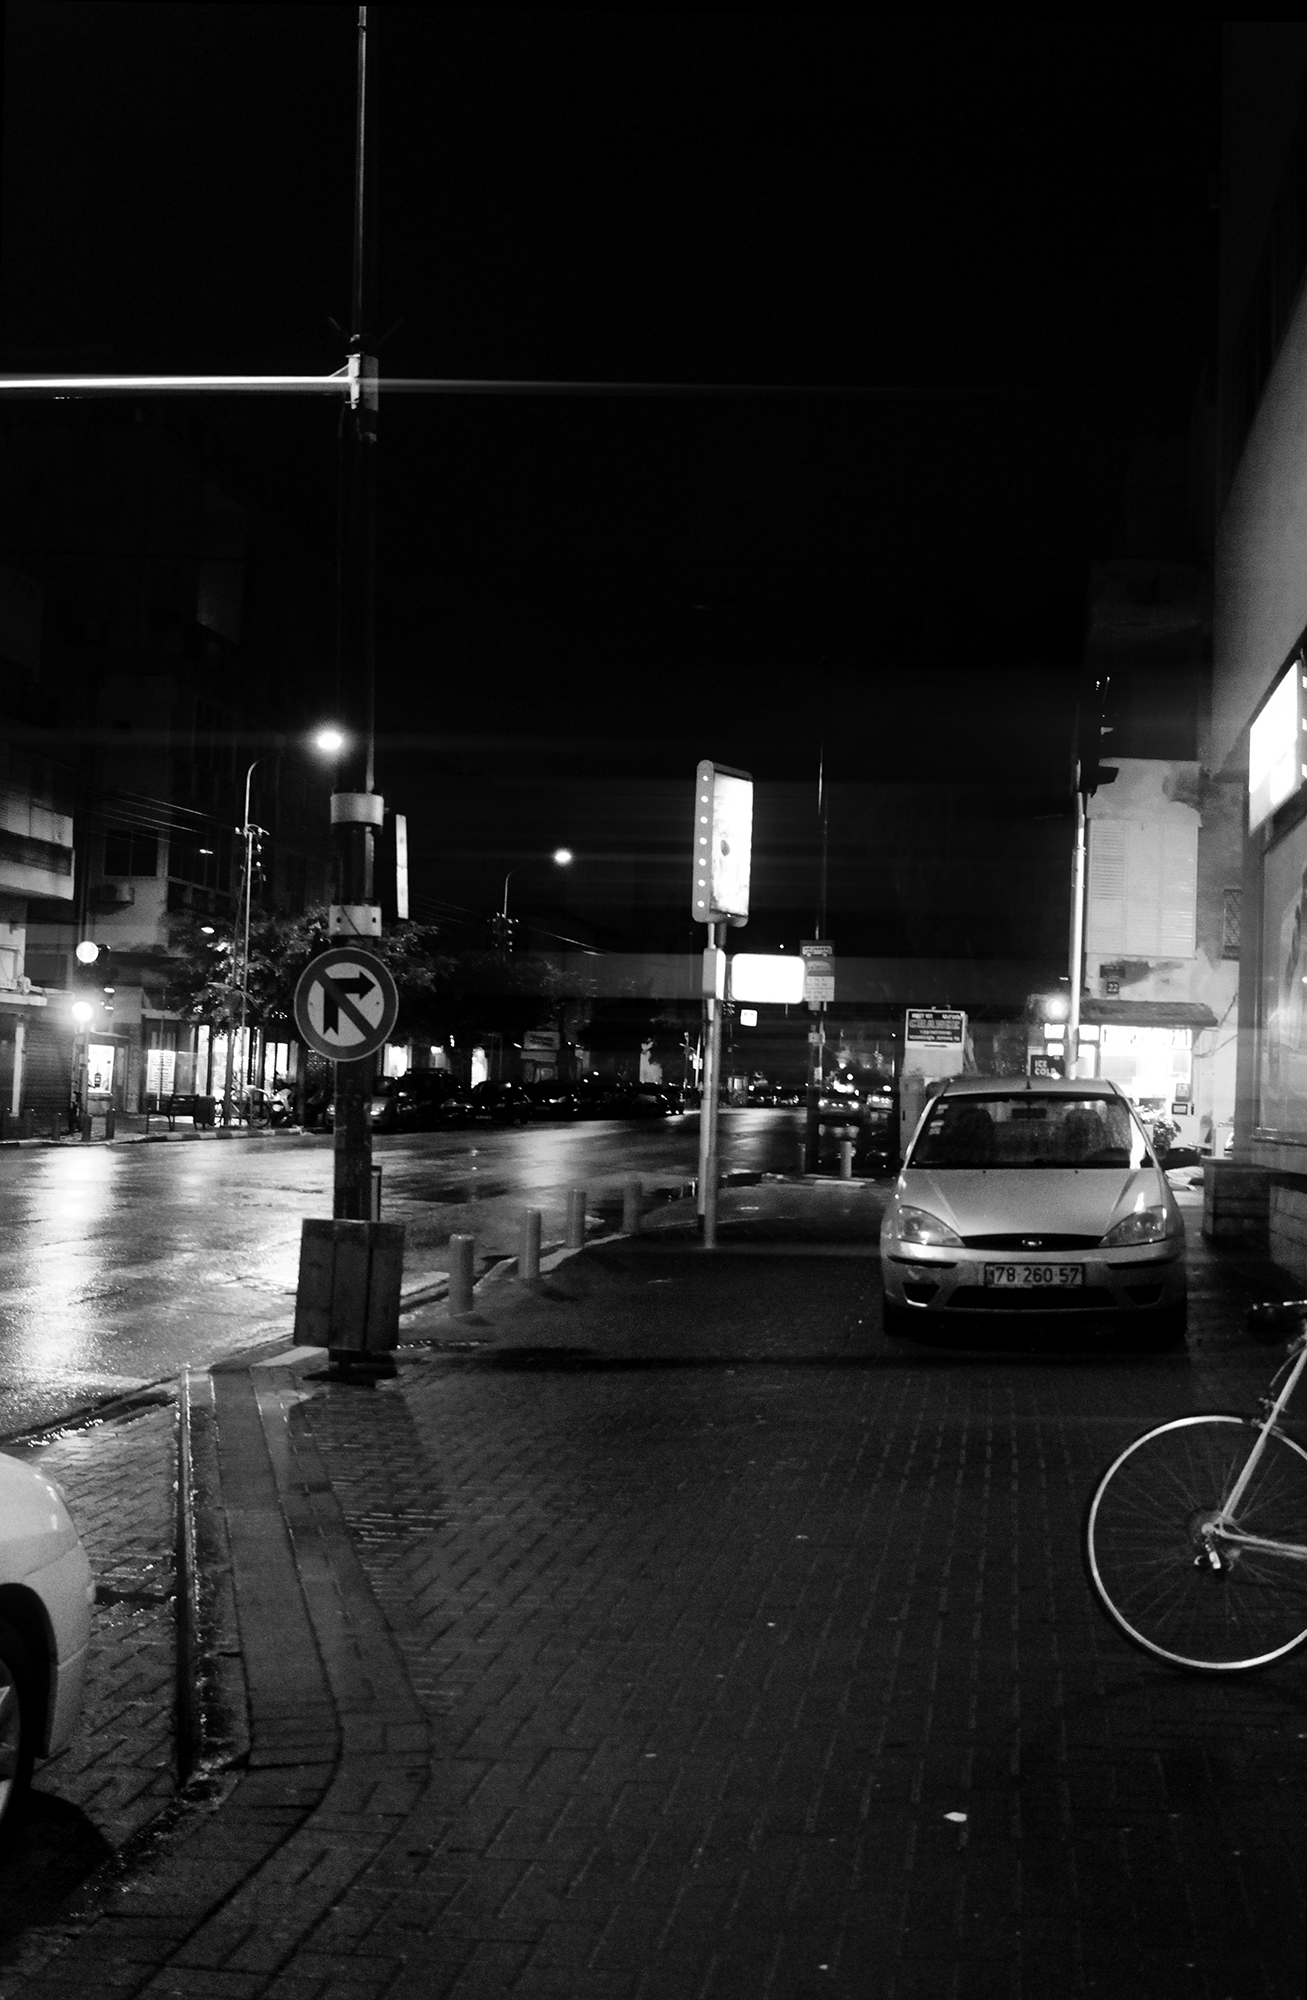 Tel Aviv-Yafo, Israel travel photography by Geena Matuson @geenamatuson #thegirlmirage.